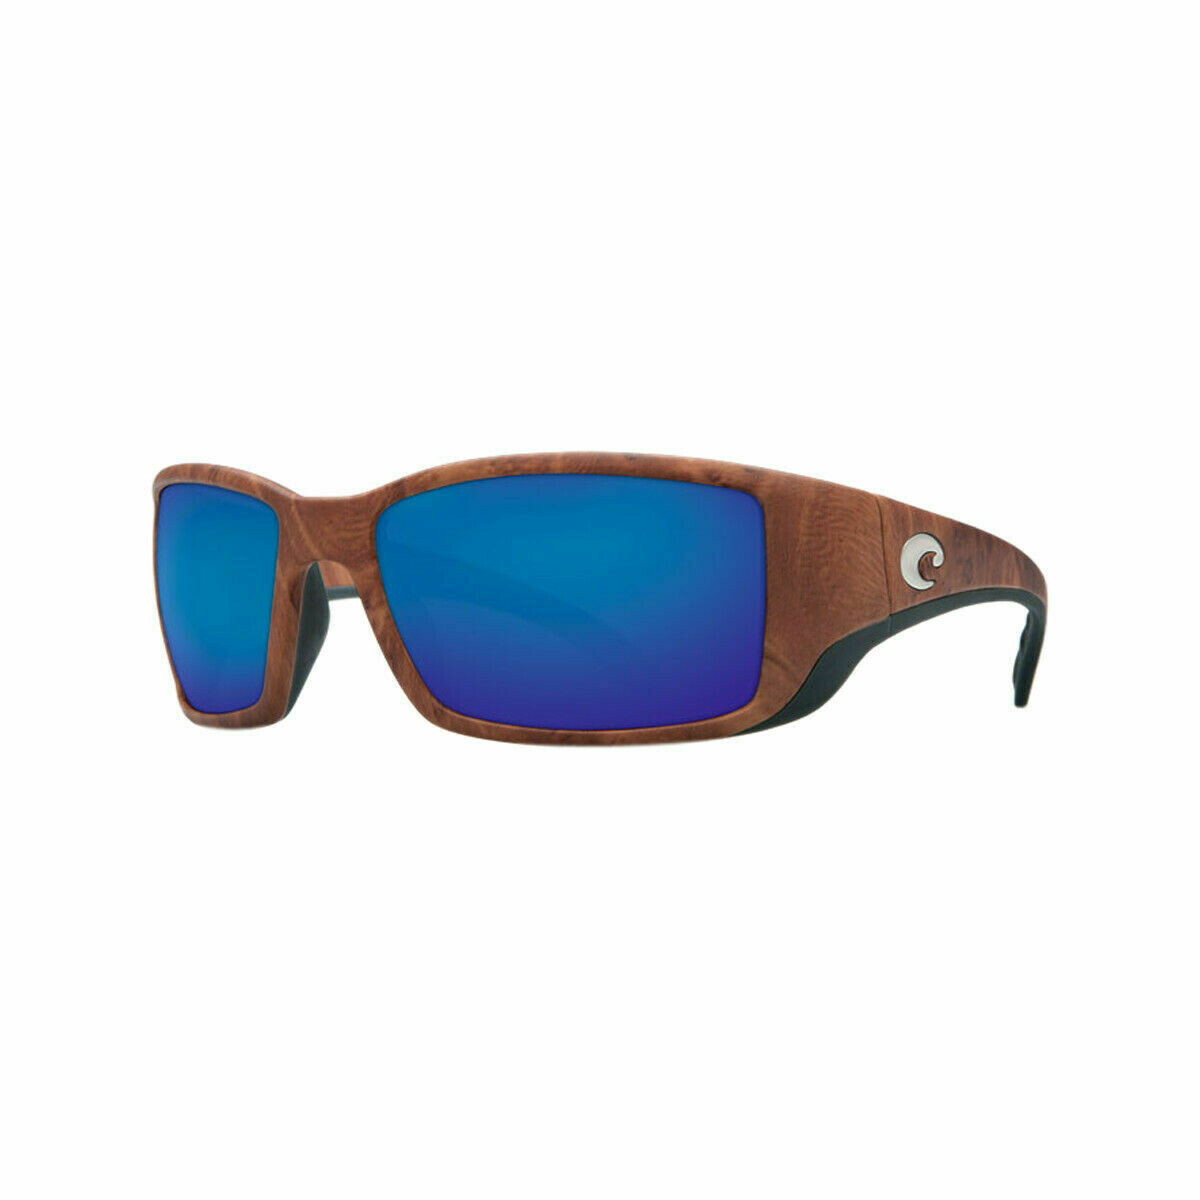 Costa Blackfin 580P Sunglasses - Gunstock/Blue Mirror